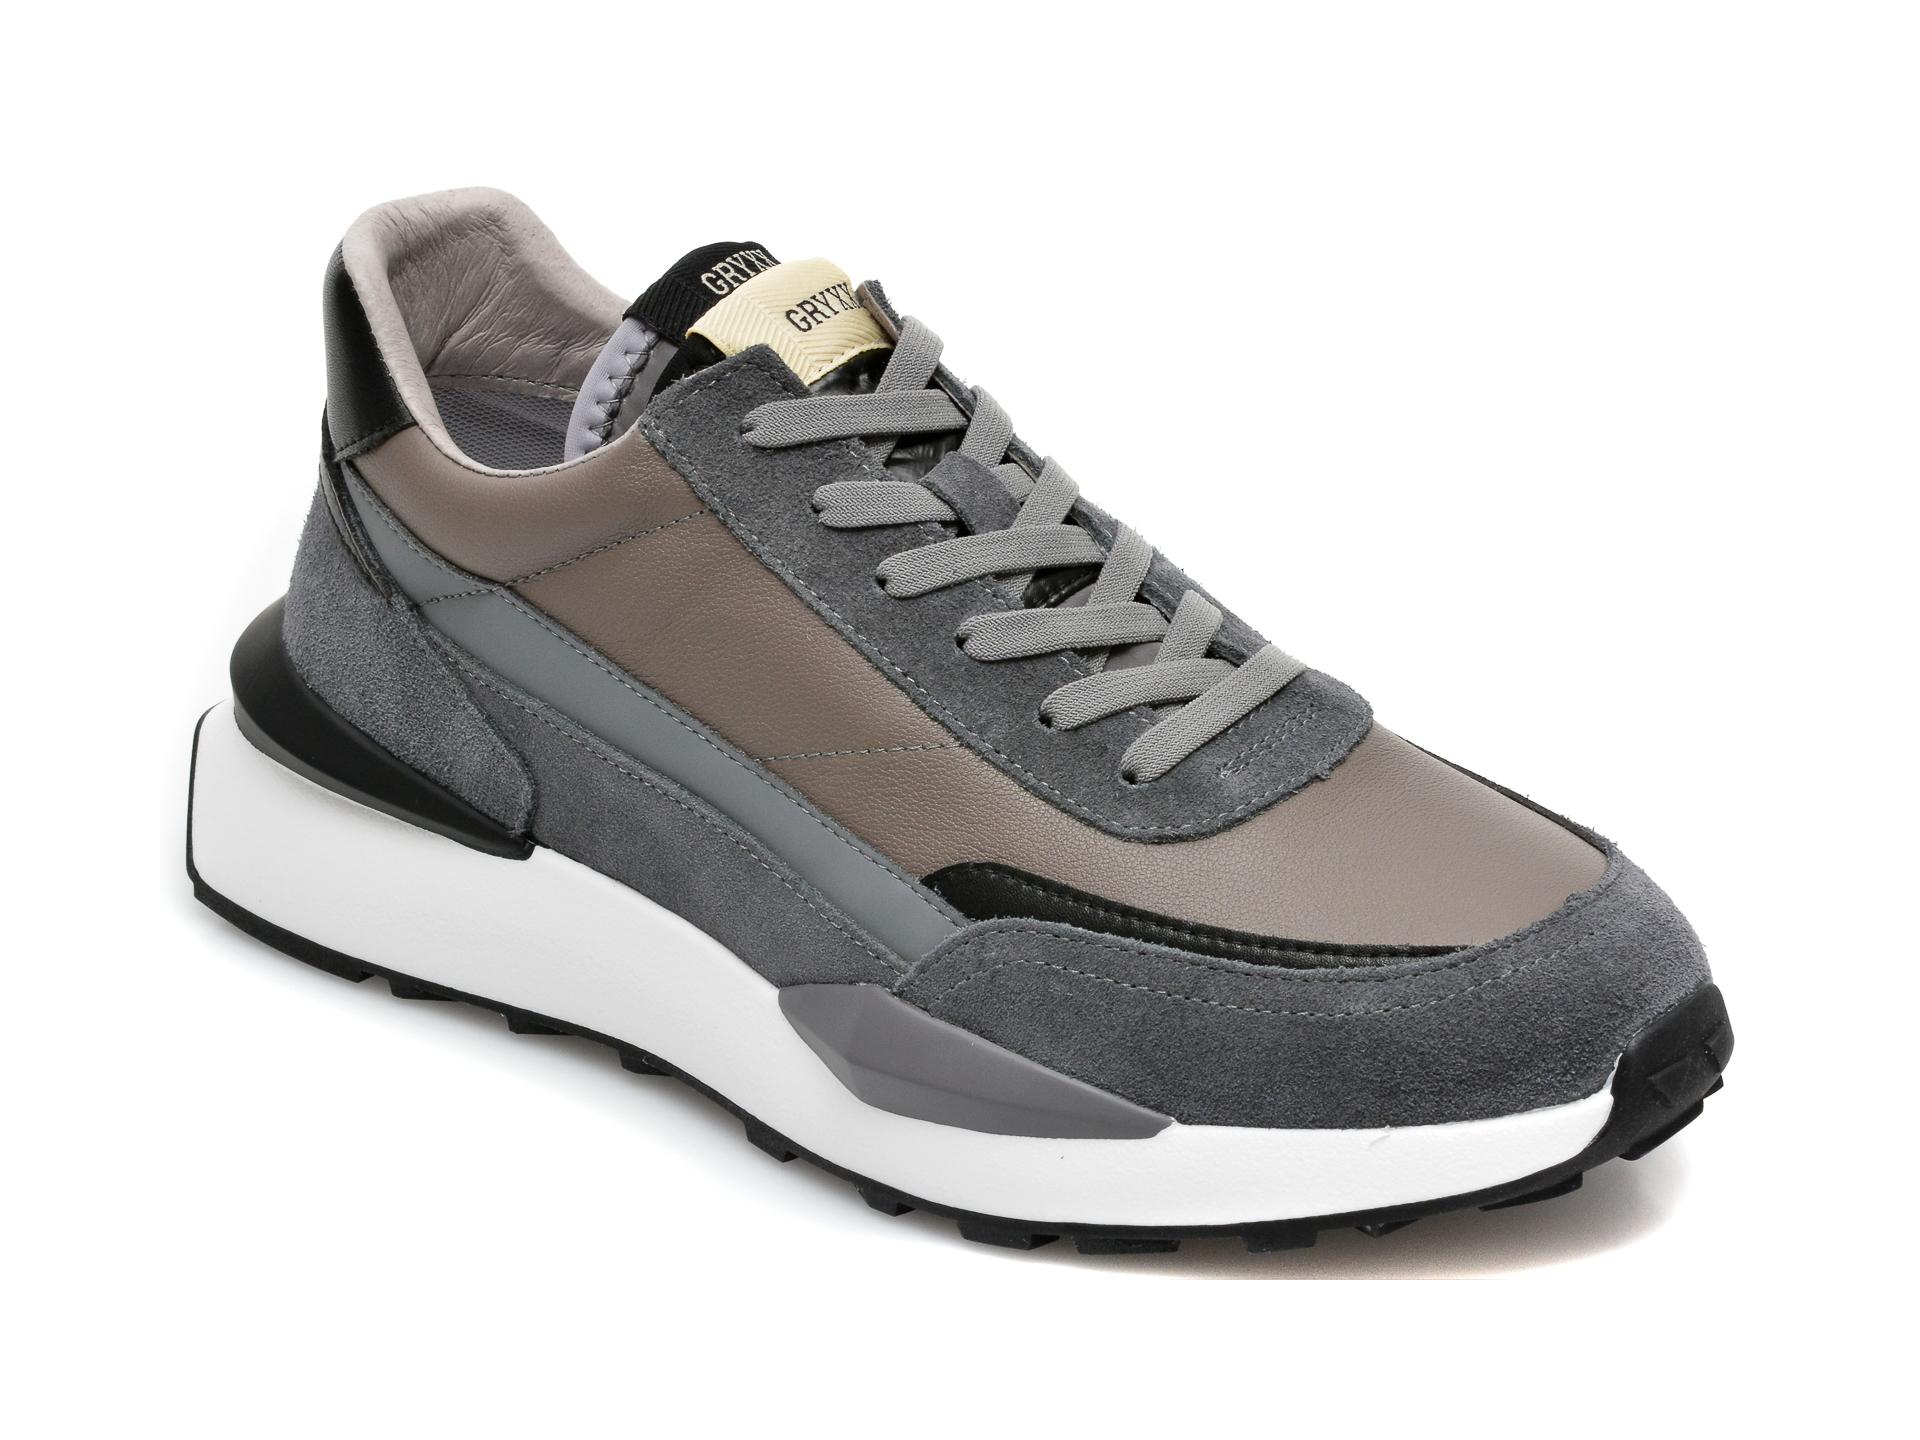 Pantofi sport GRYXX gri, 20735, din piele naturala imagine otter.ro